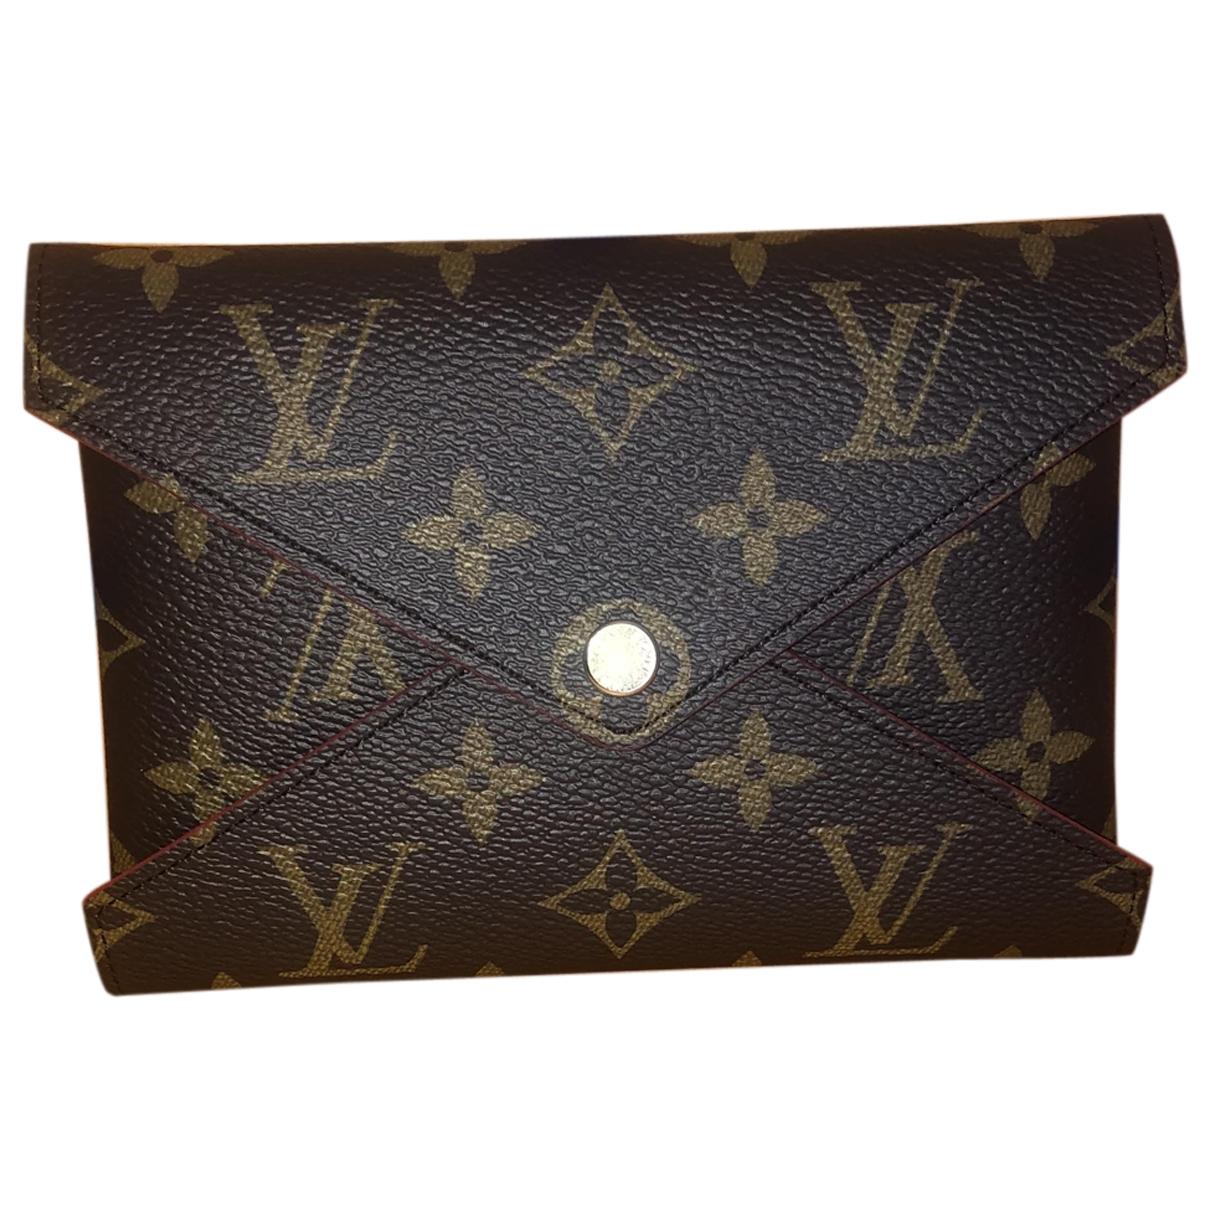 Louis Vuitton Kirigami Brown Cloth Purses, wallet & cases for Women \N